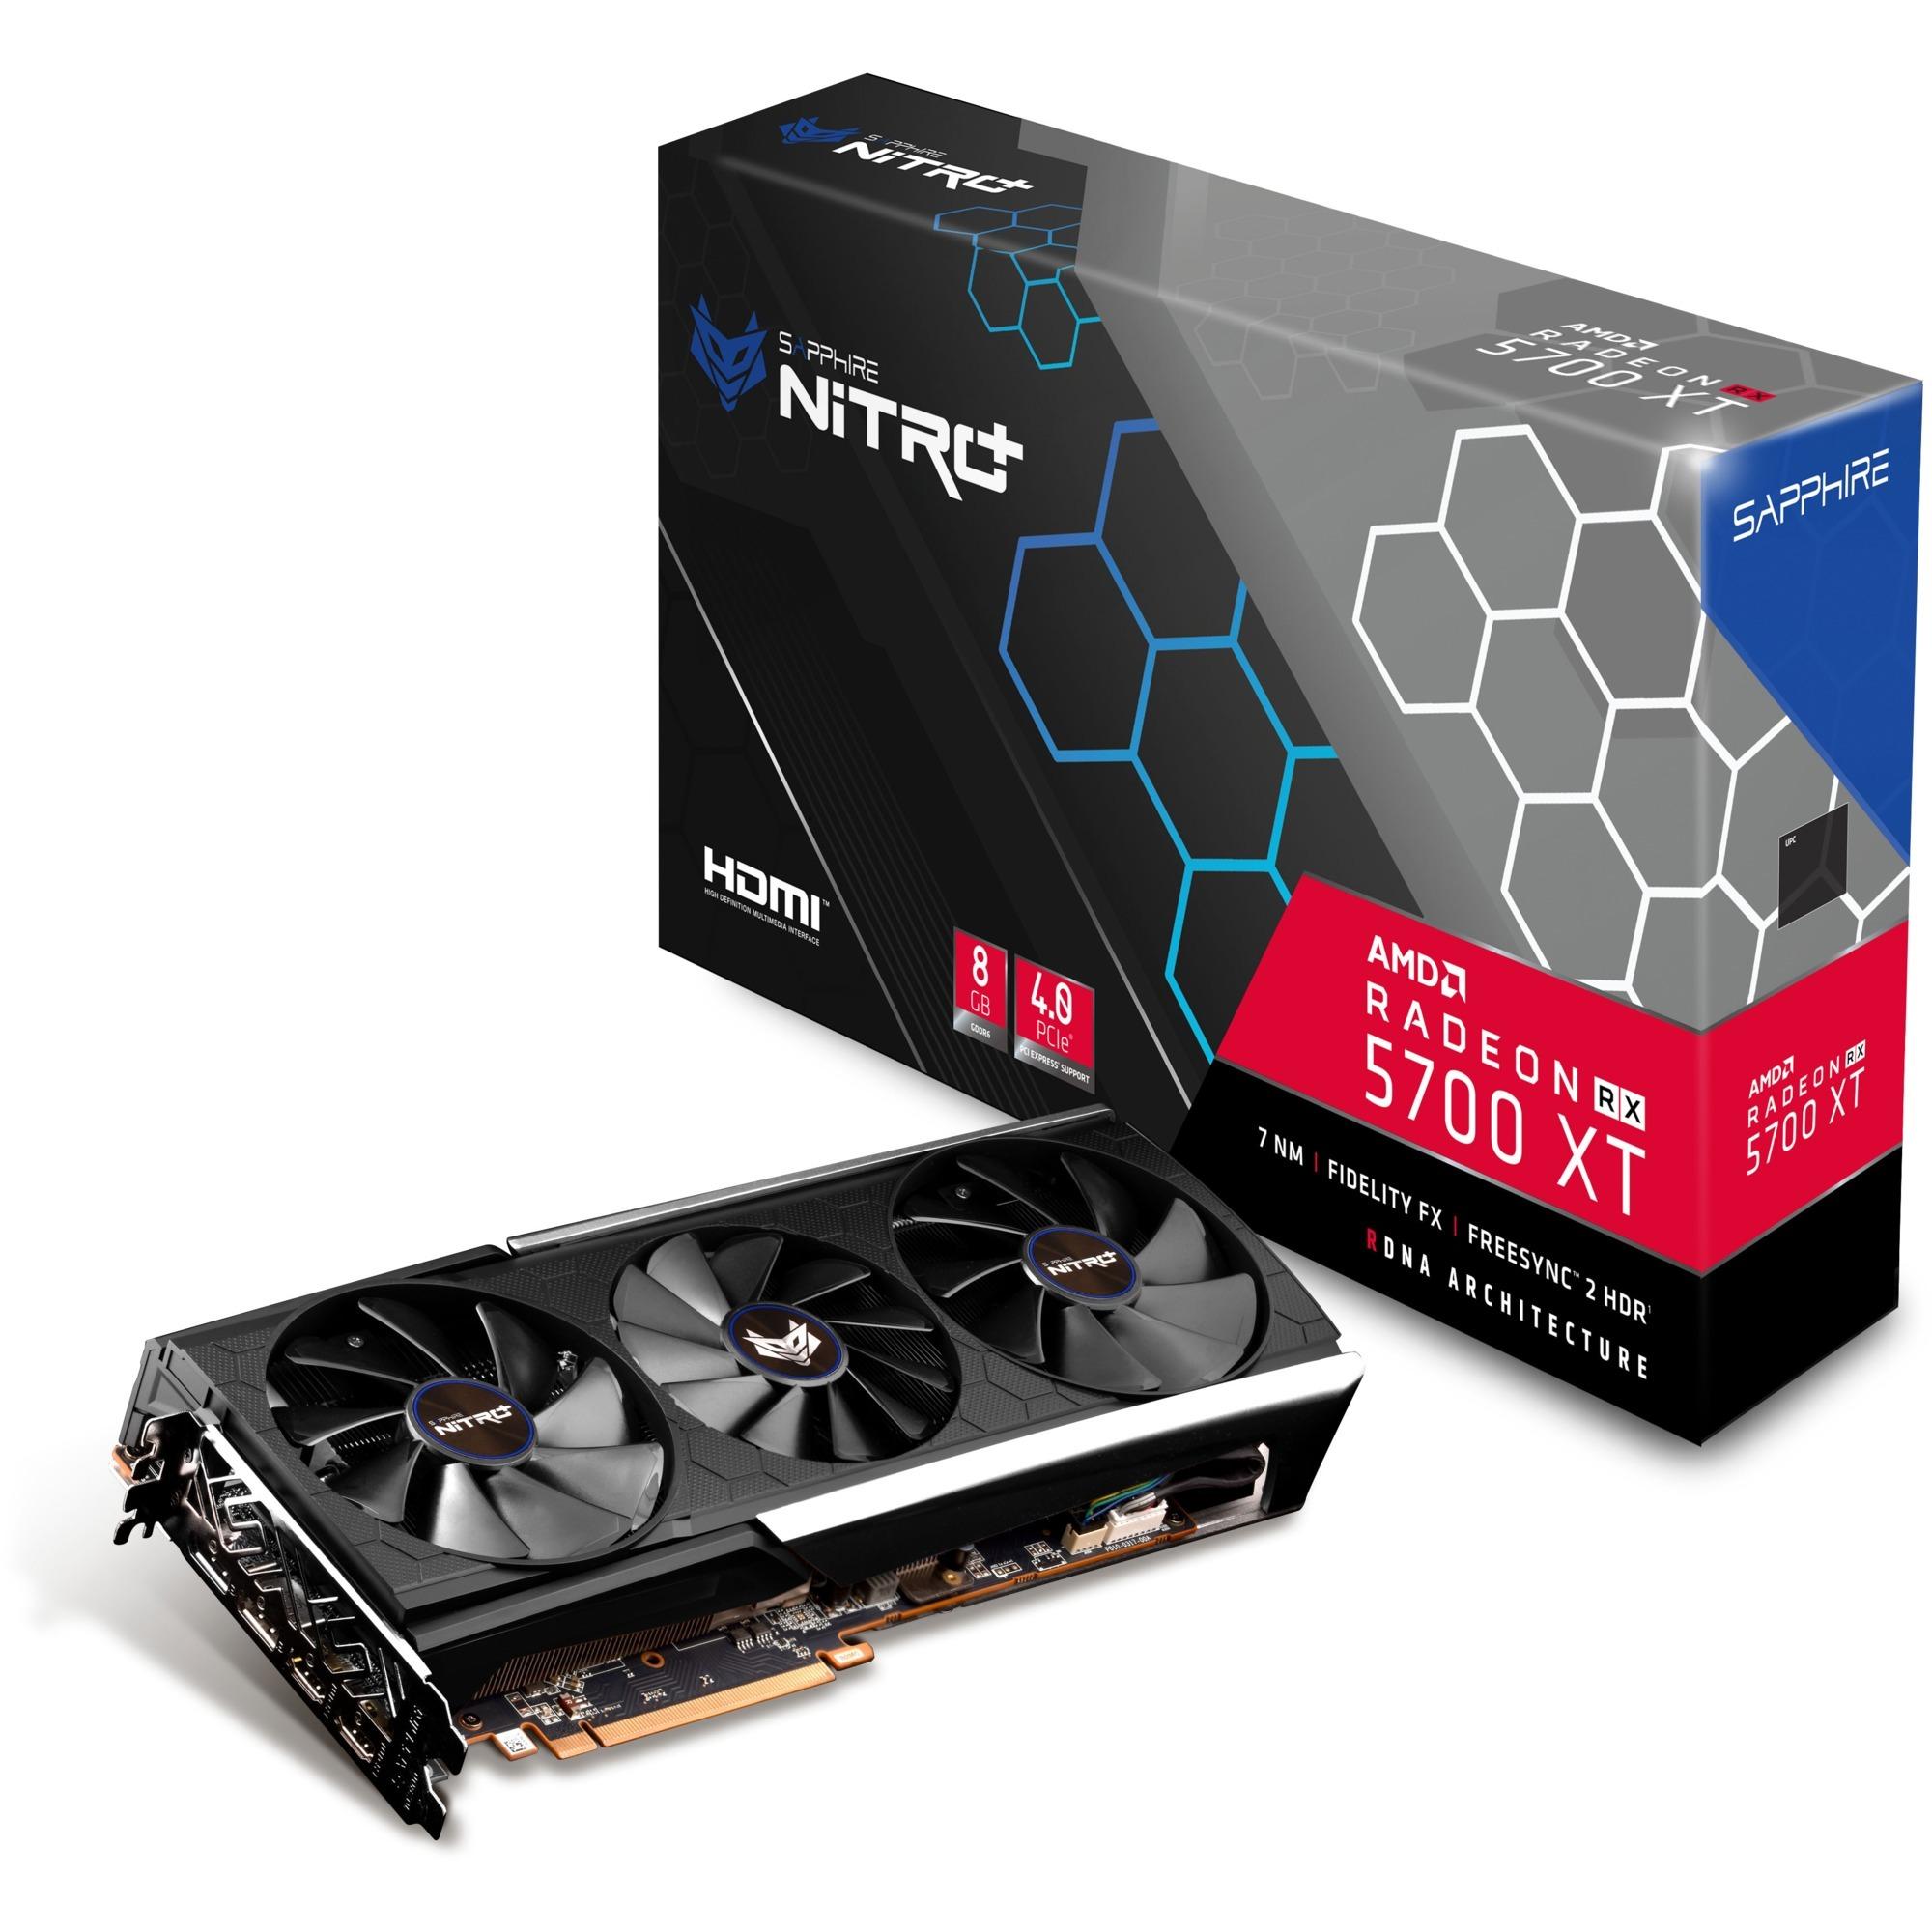 11293-03-40G tarjeta gráfica Radeon RX 5700 XT 8 GB GDDR6